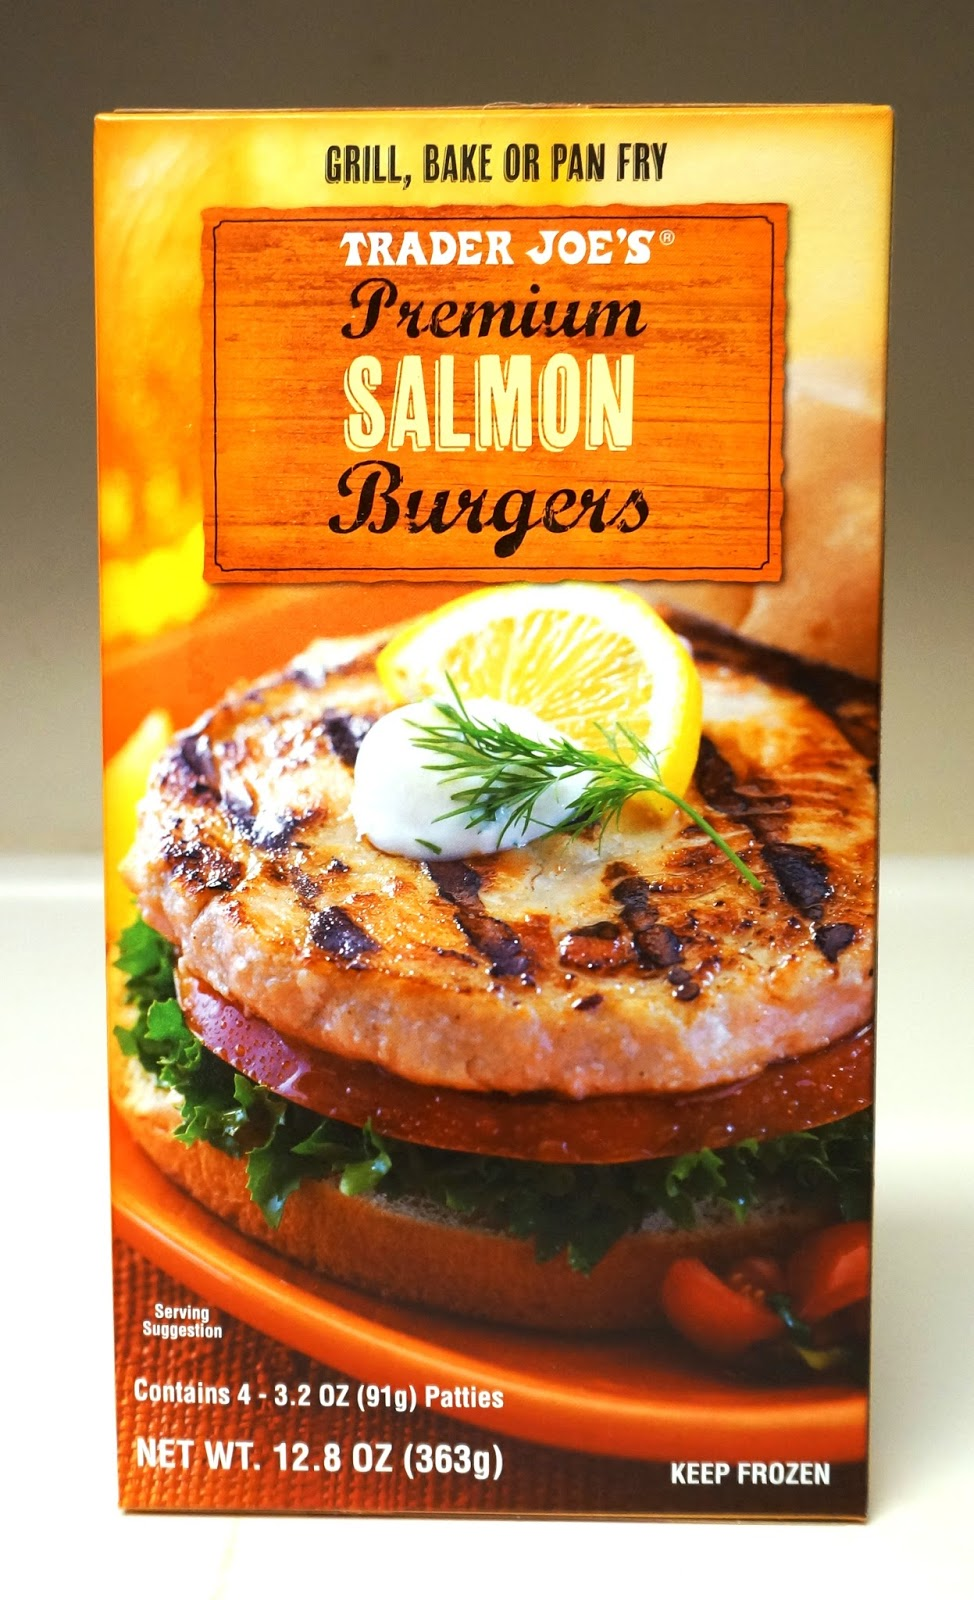 Exploring trader joe 39 s trader joe 39 s premium salmon burgers for Trader joe s fish